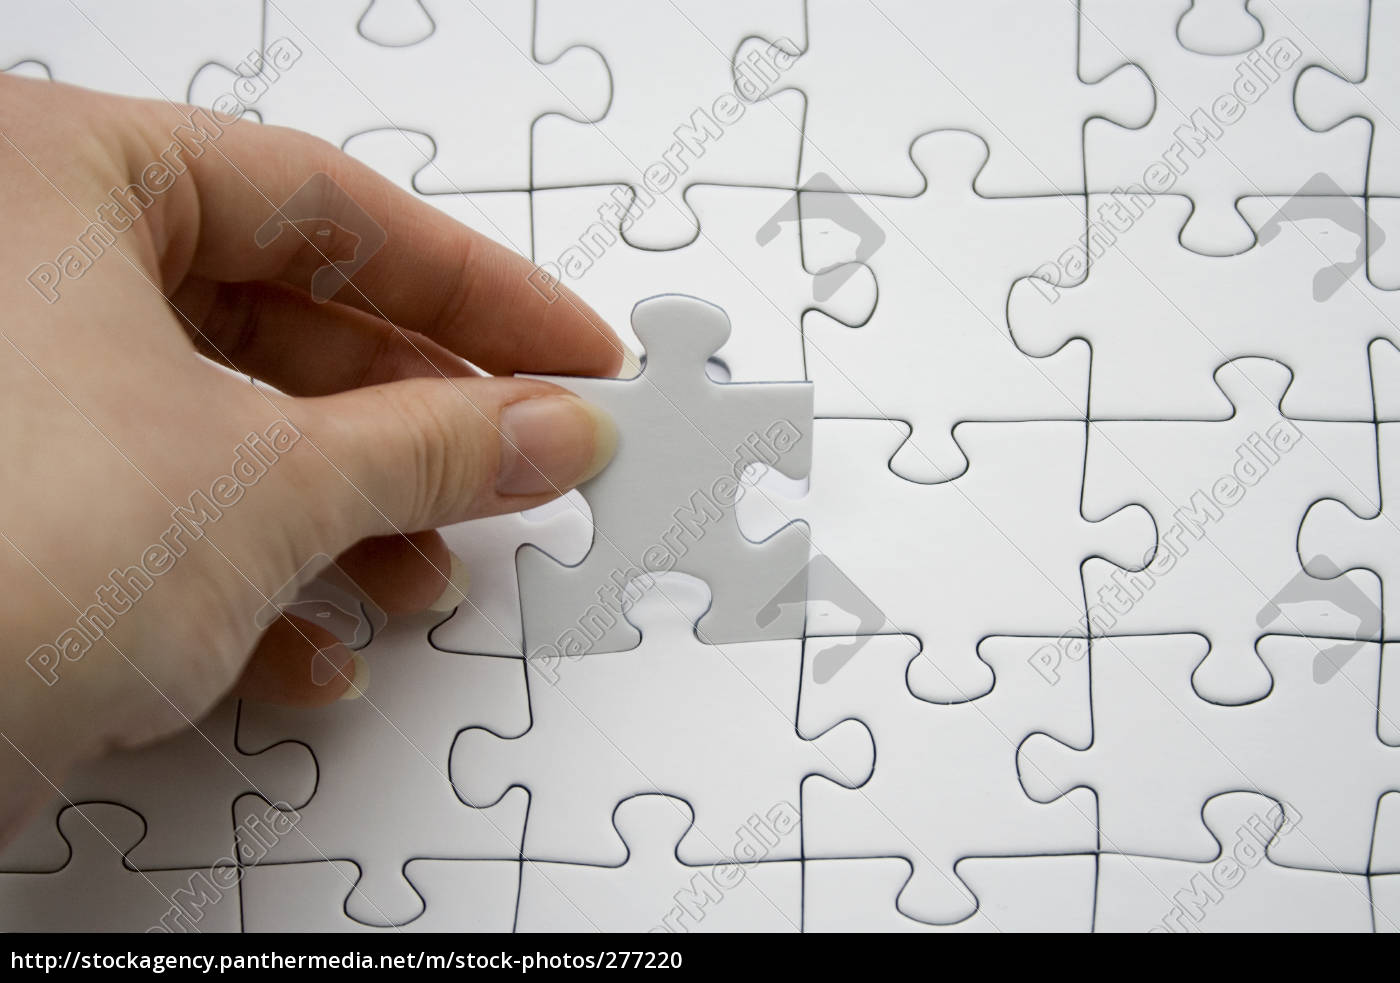 the, last, puzzle, piece - 277220